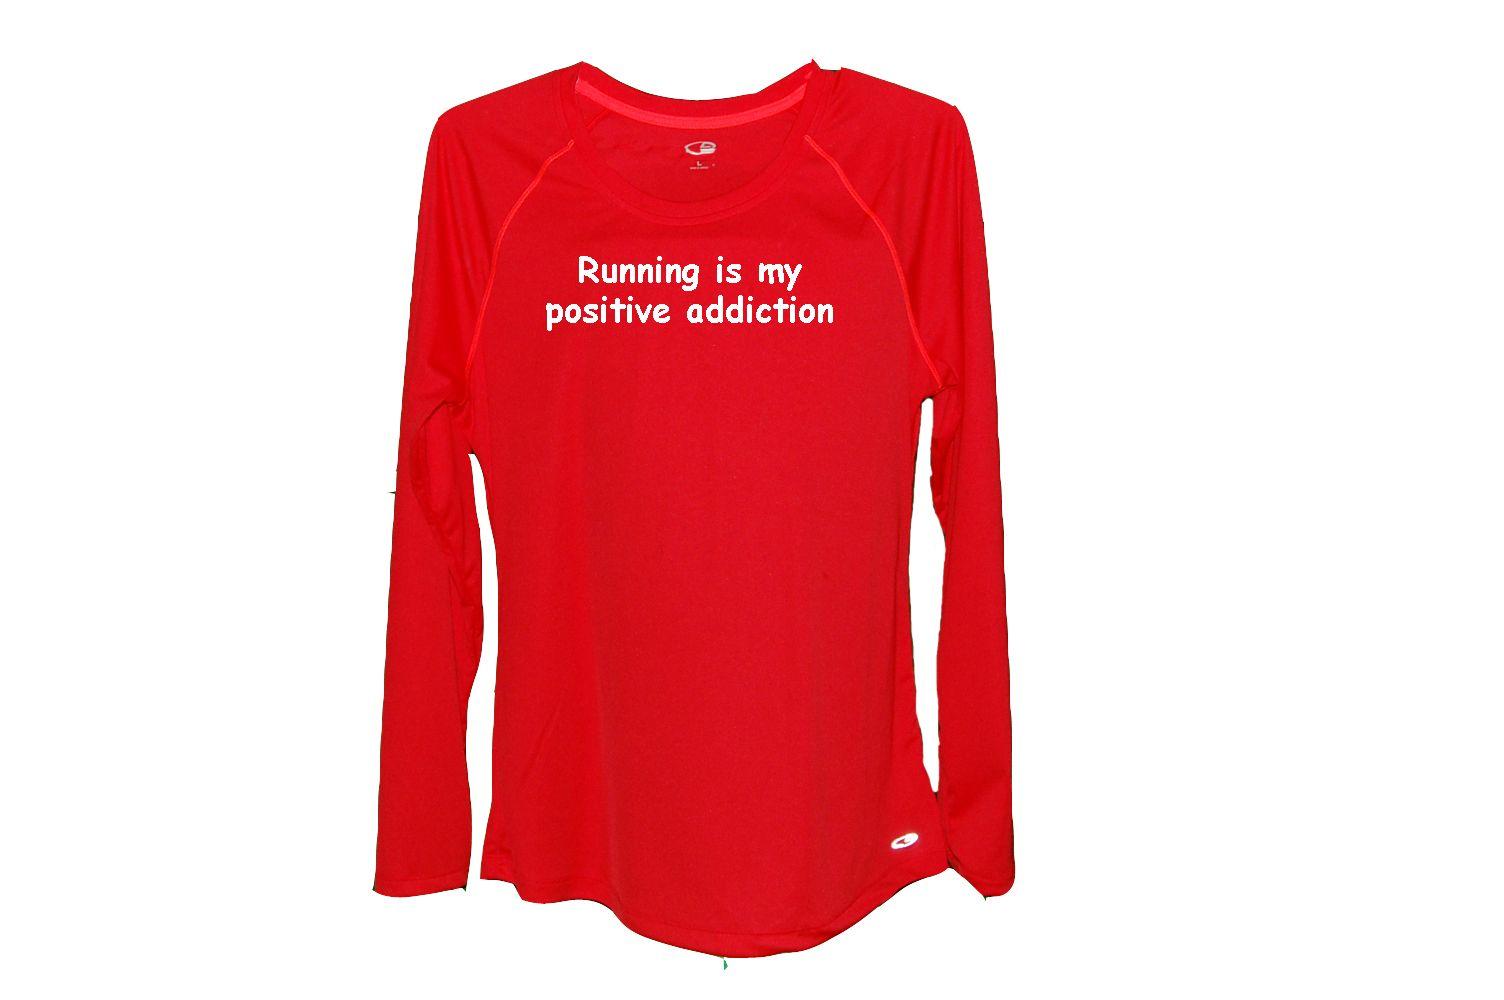 596ce2729 Running is my positive addiction. Custom running shirts with attitude!